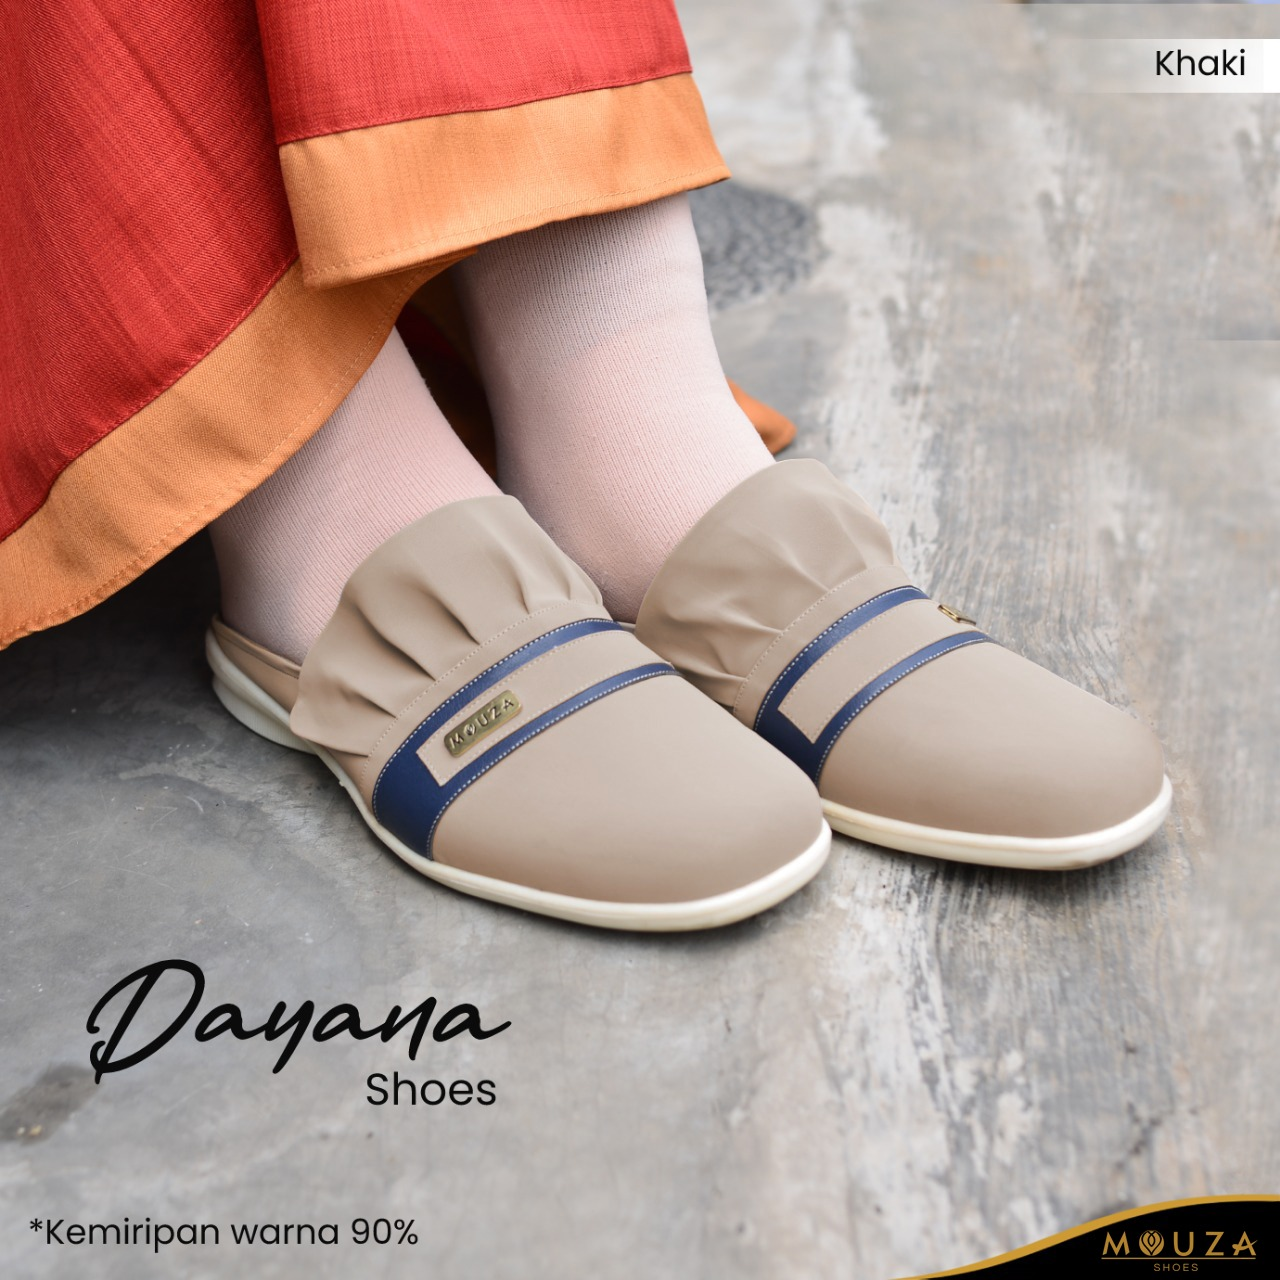 Dayana Shoes